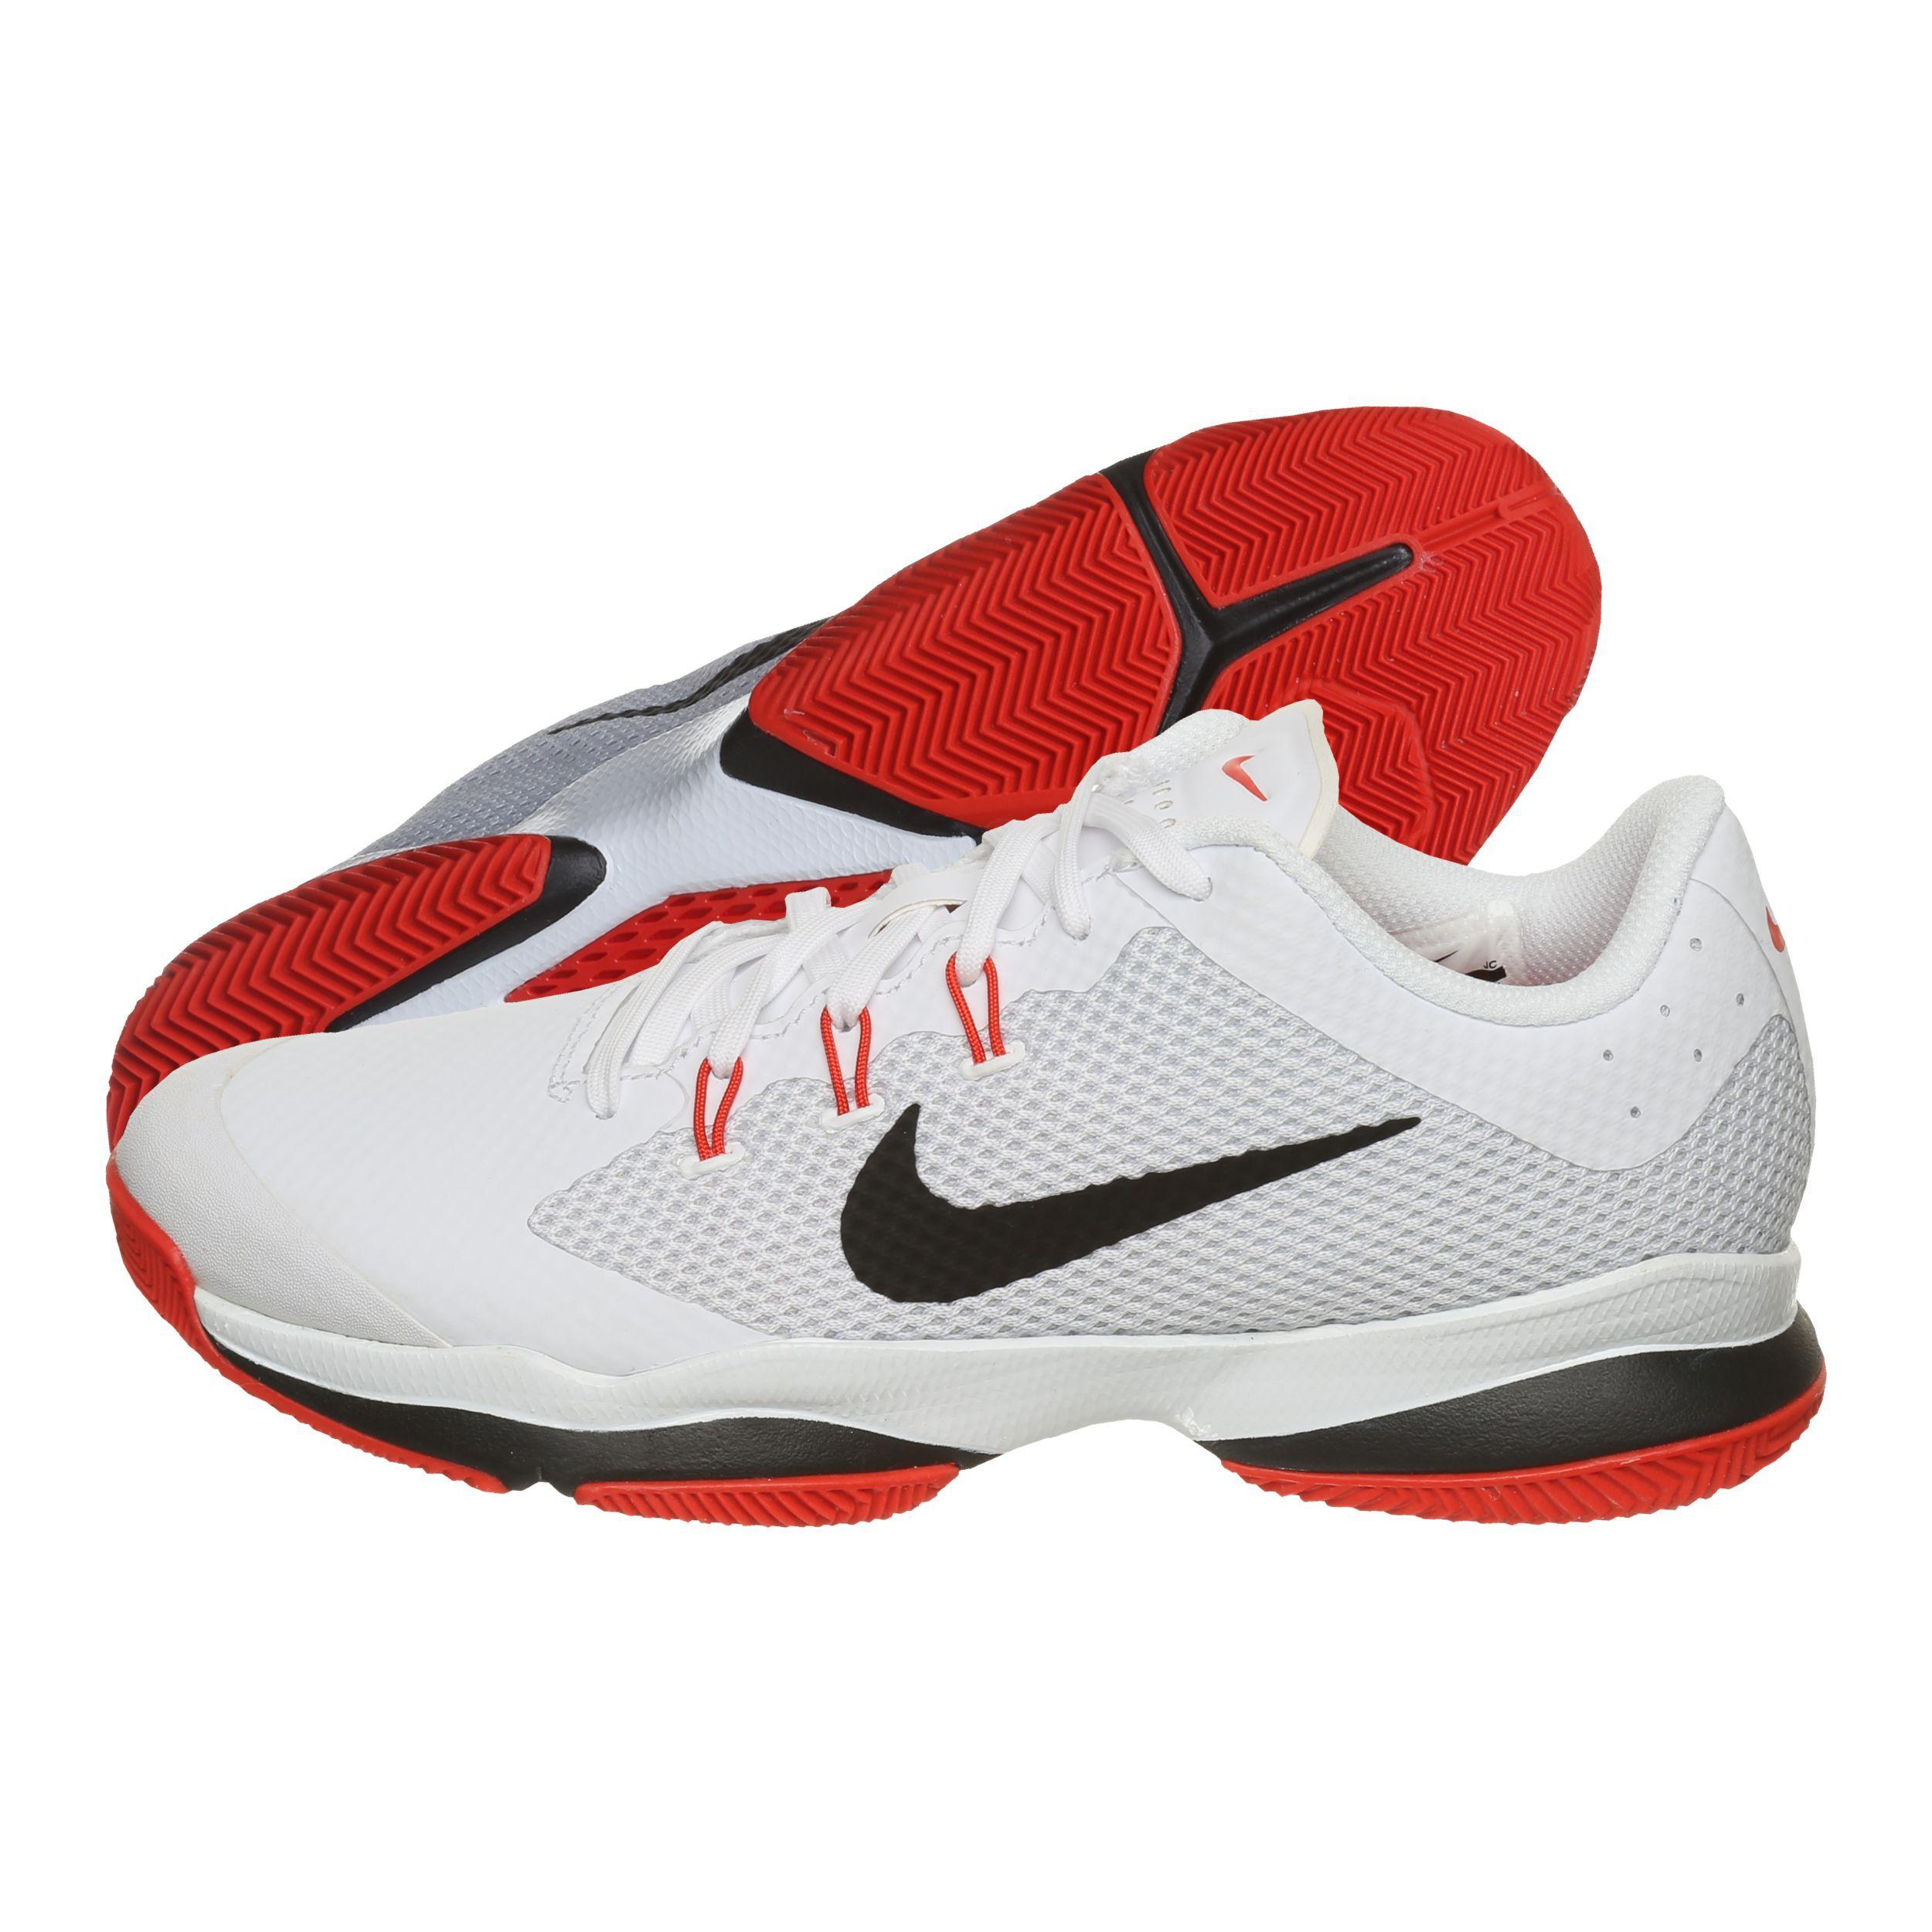 Nike Air Zoom Ultra Scarpa Per Tutte Le Superfici Bambini